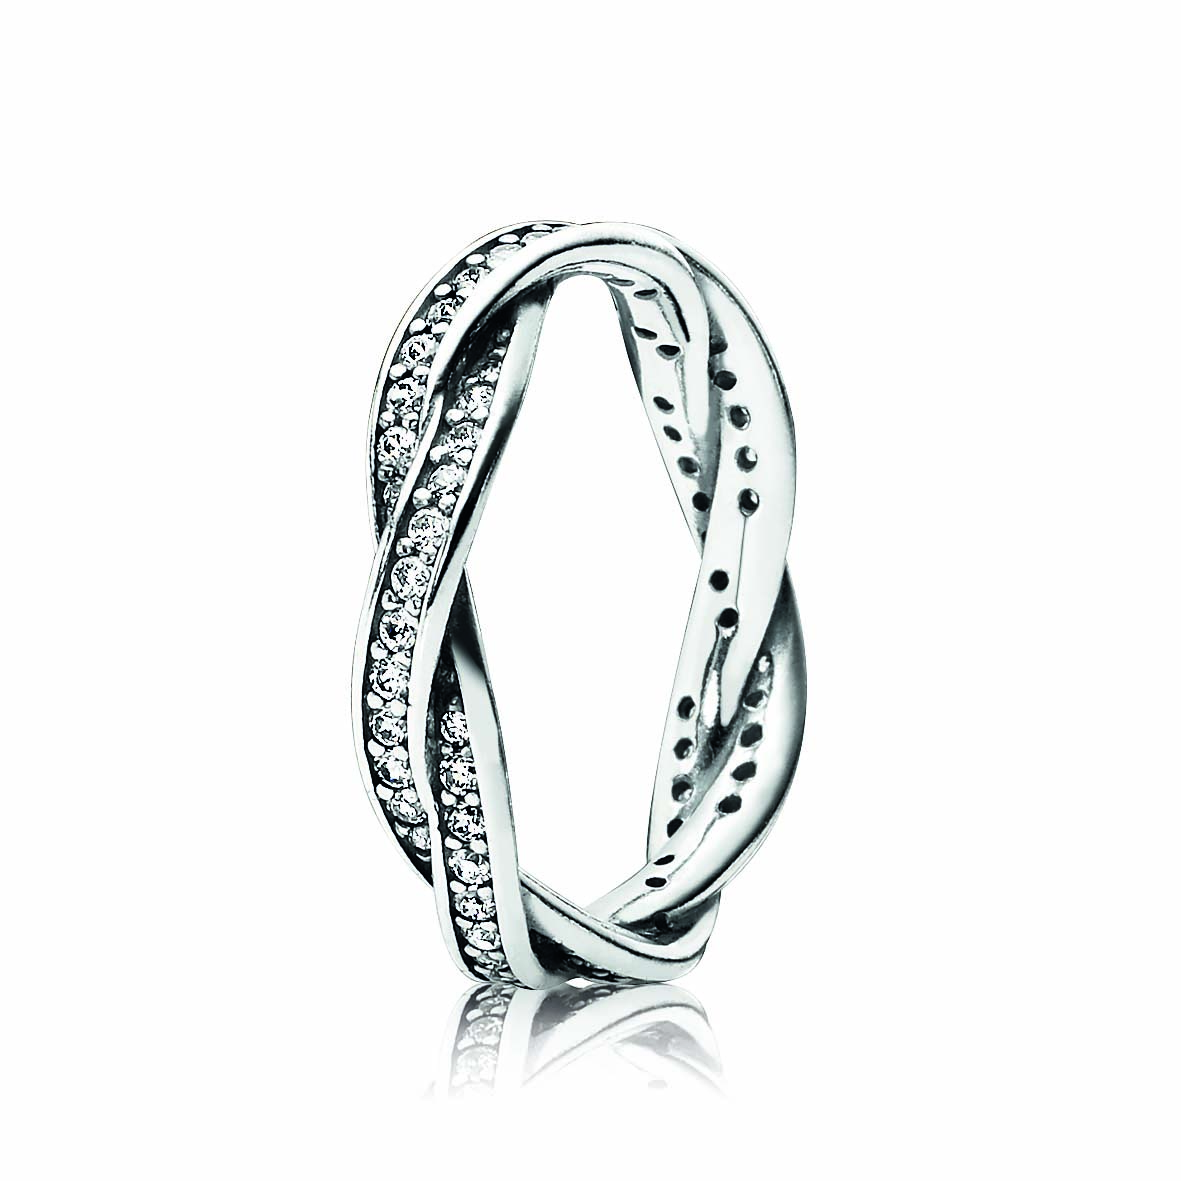 PANDORA_Valentine's 2014_Braided Silver and Cubic Zirconia Pavé Ring_HK$899.jpg